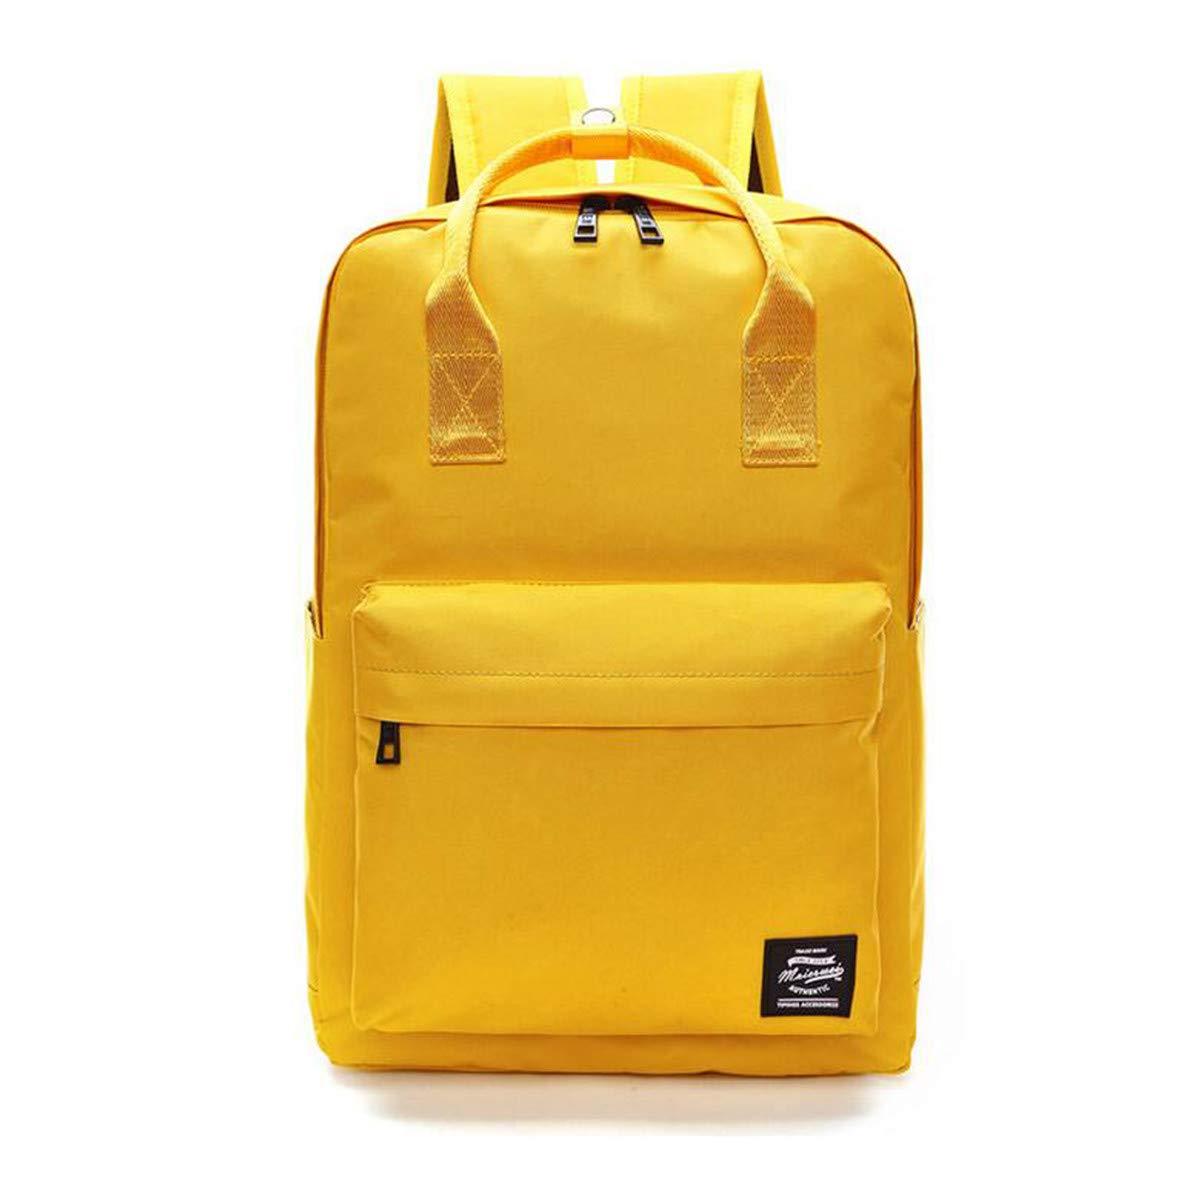 YingTech Lady Boy Girls Backpack Women Preppy School Bags For Teenagers Men Oxford Travel Bags Girls Laptop Backpack Mochila (Yellow) by YingTech